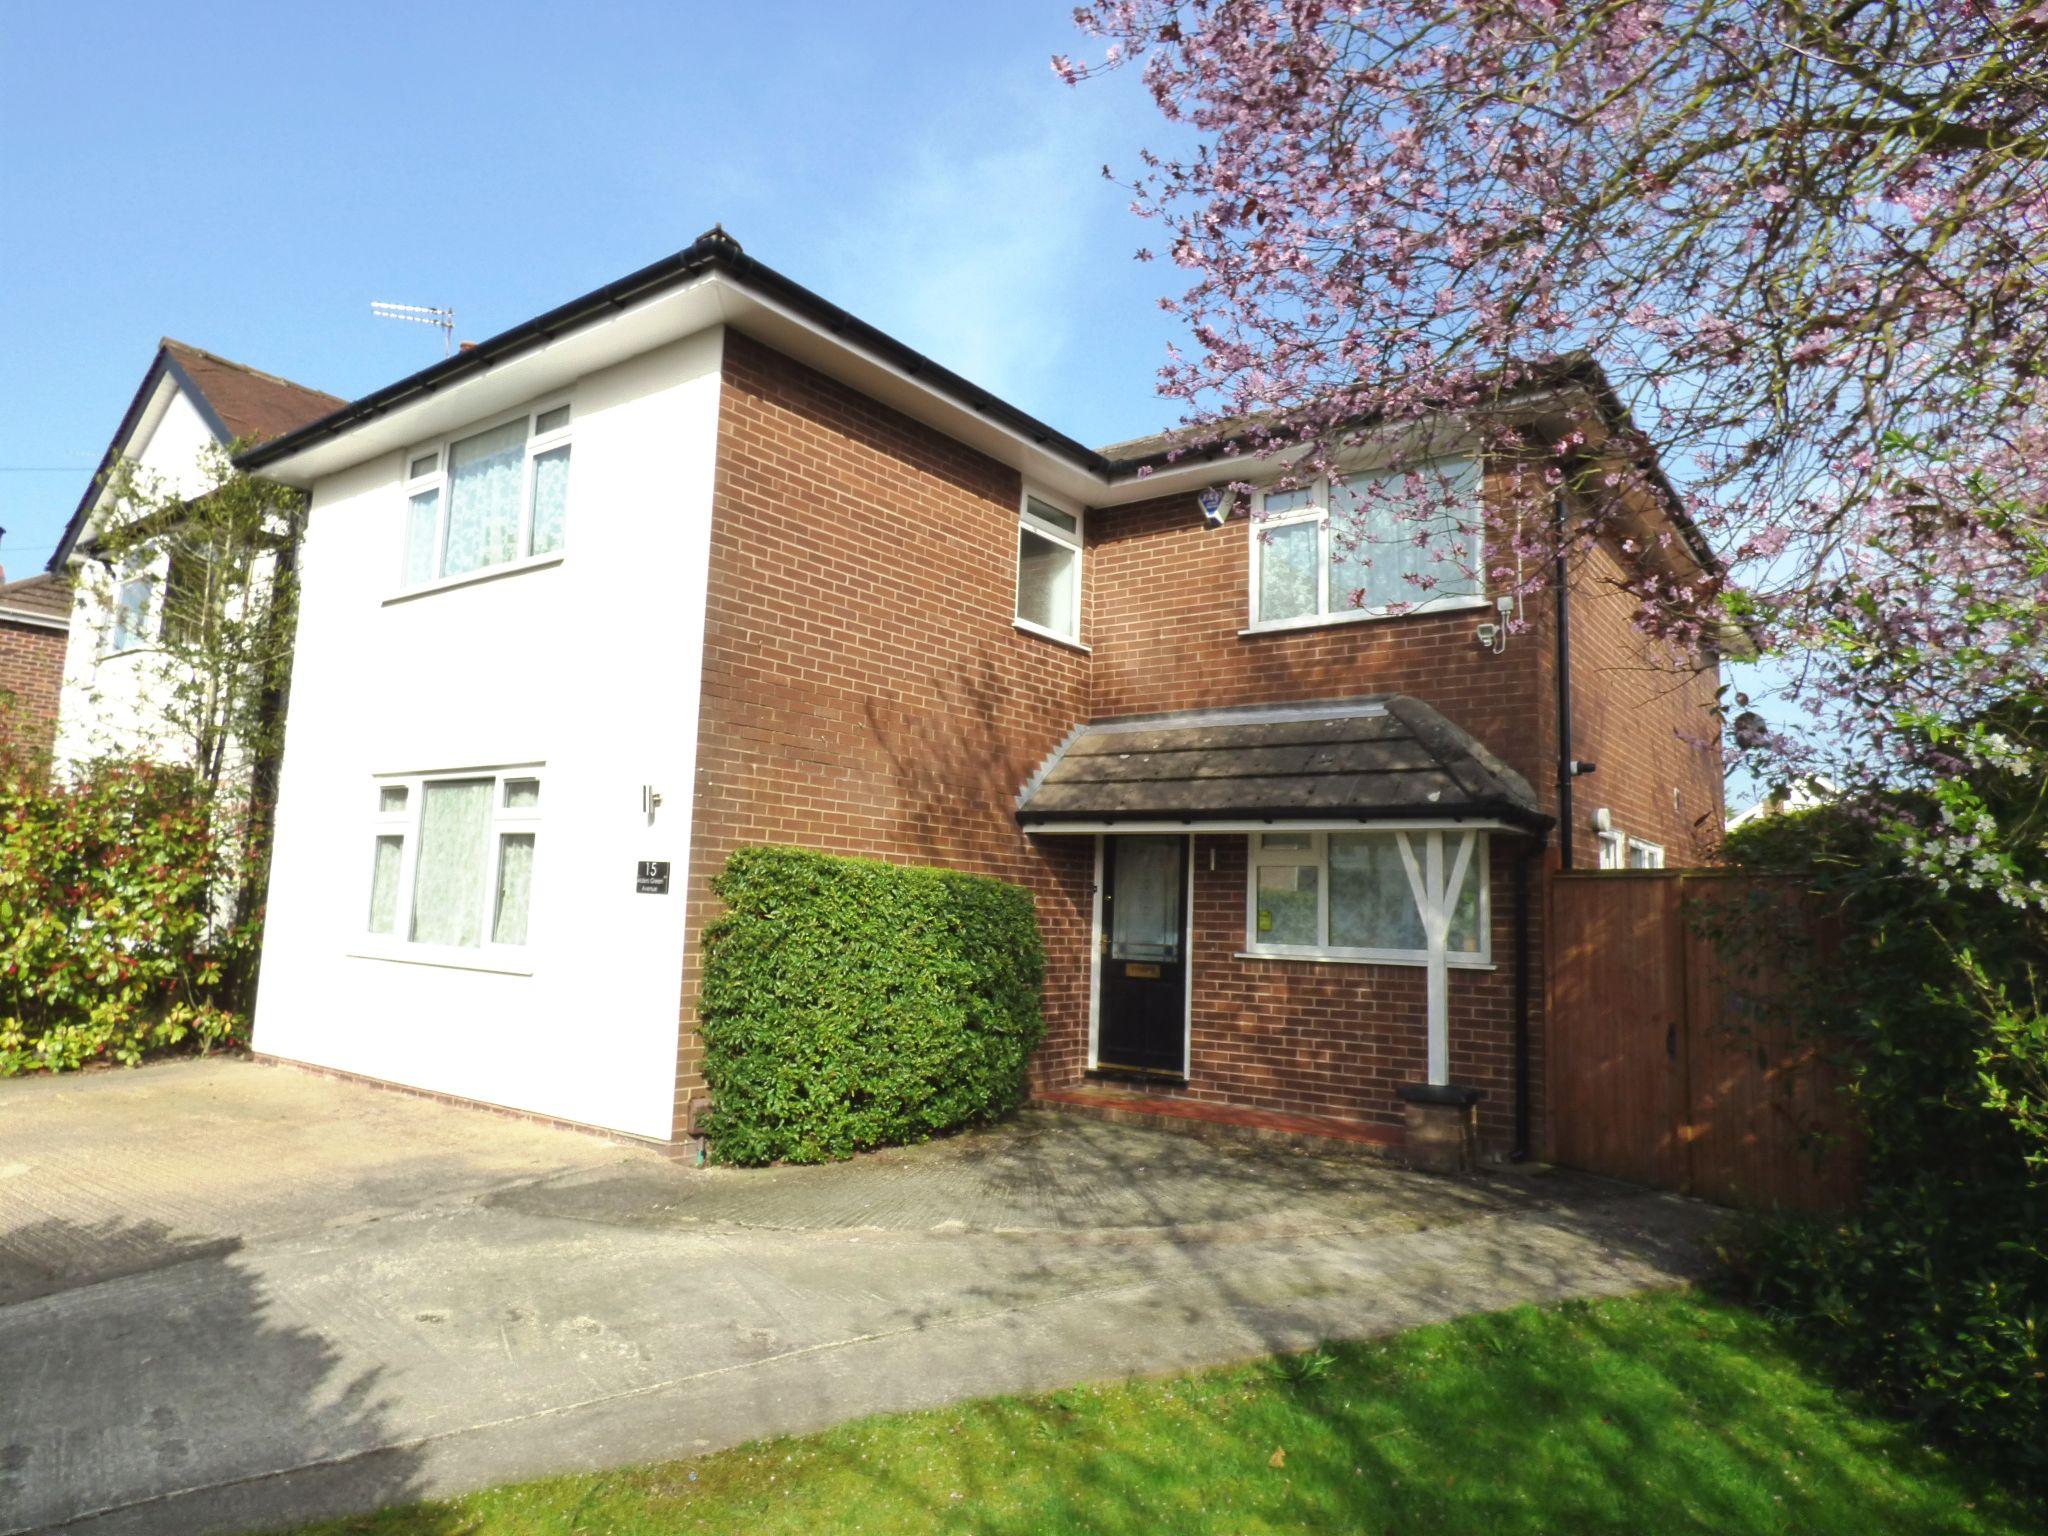 4 Bedroom Detached House For Sale - Front External